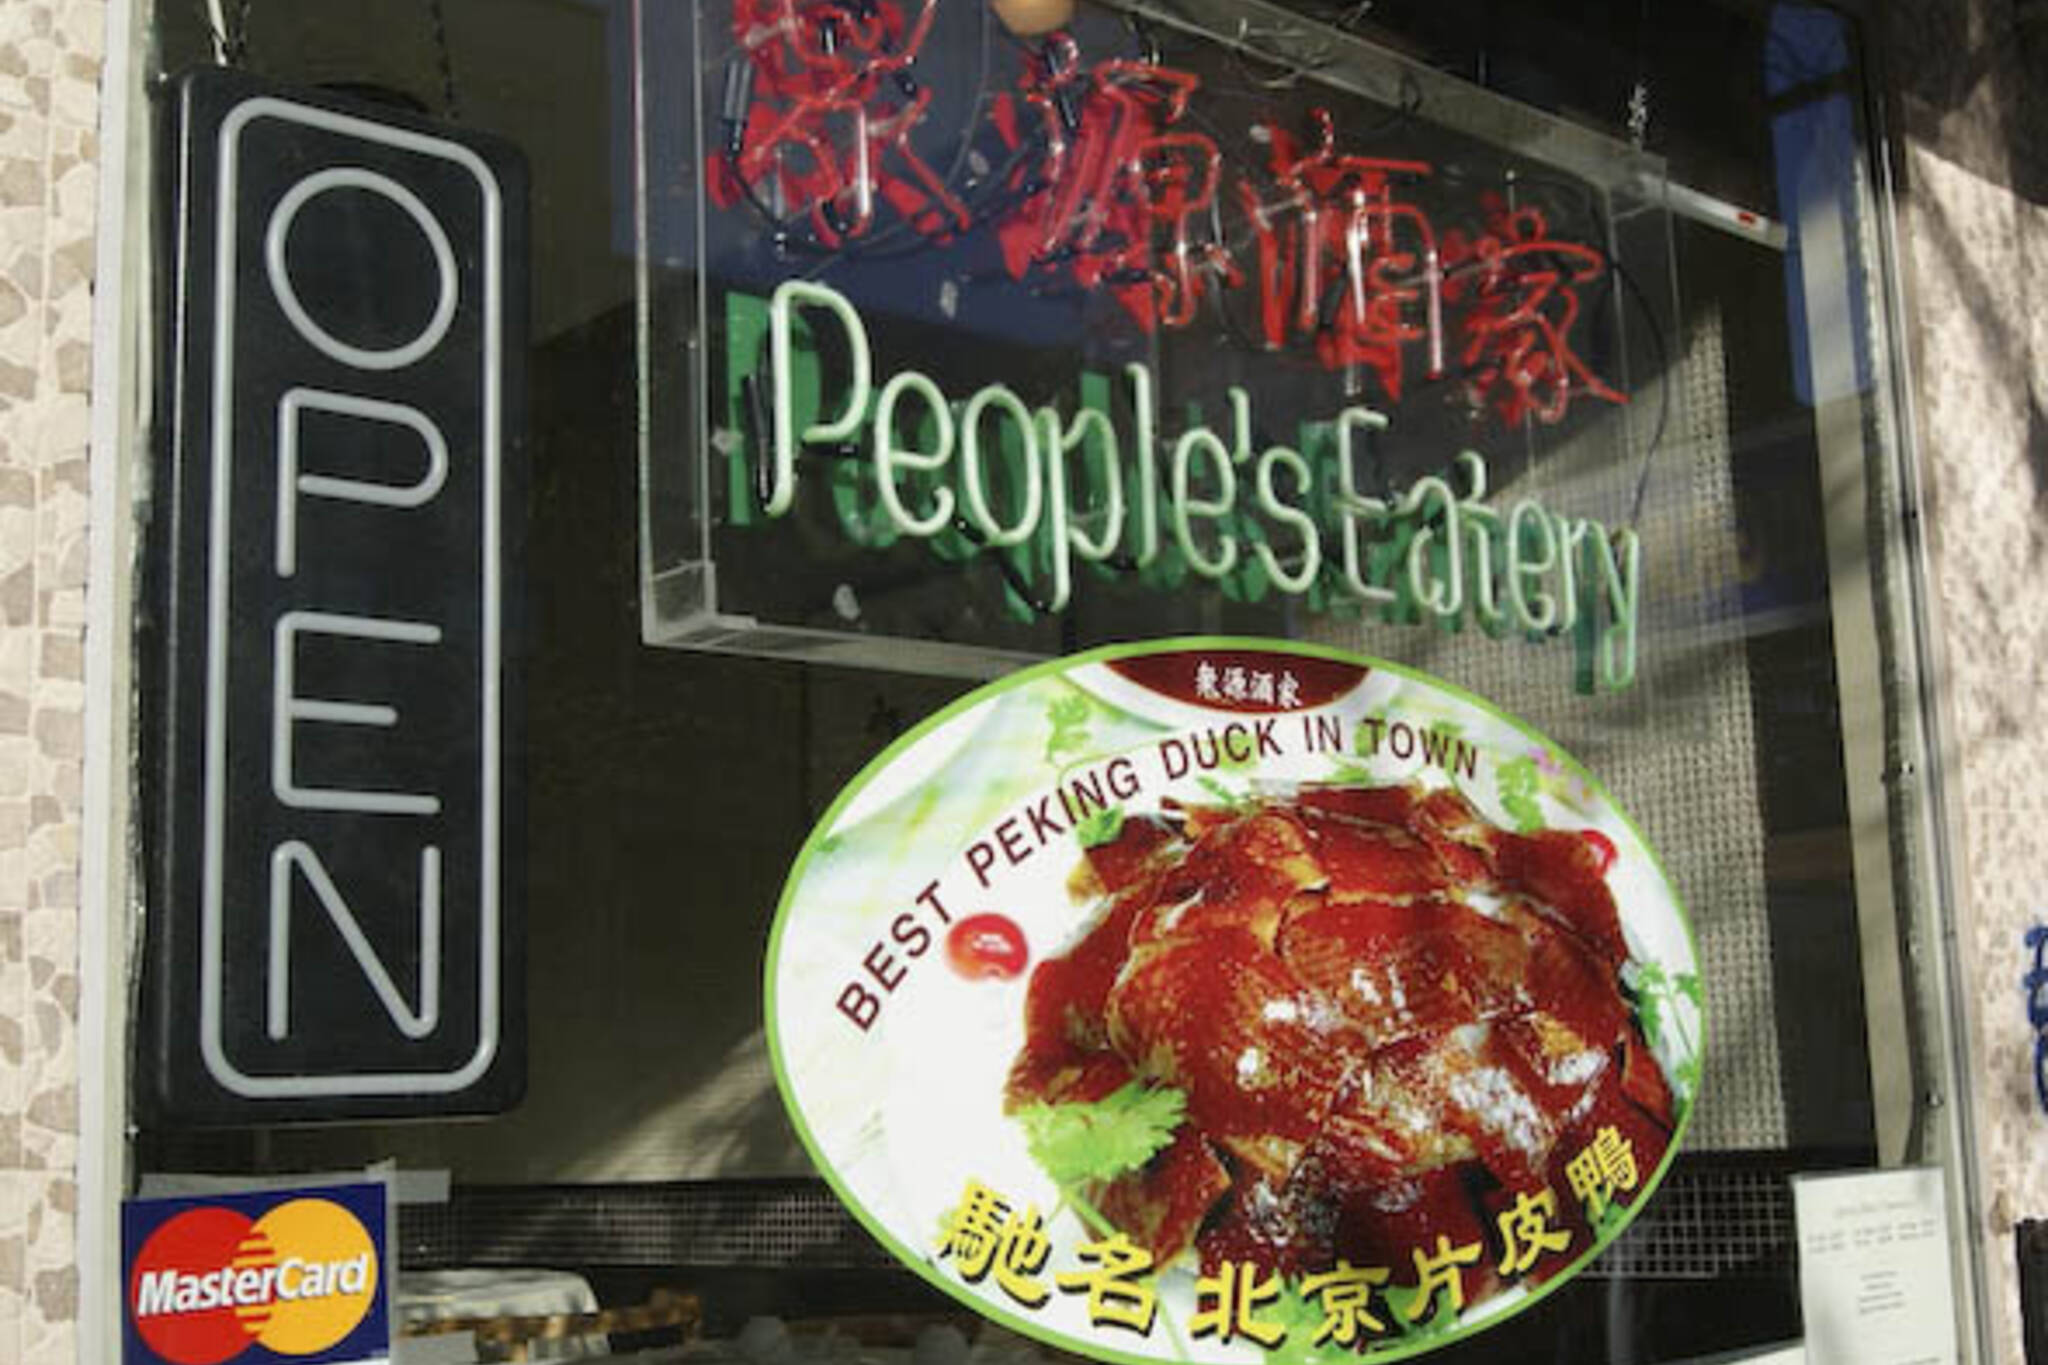 People's Eatery Toronto